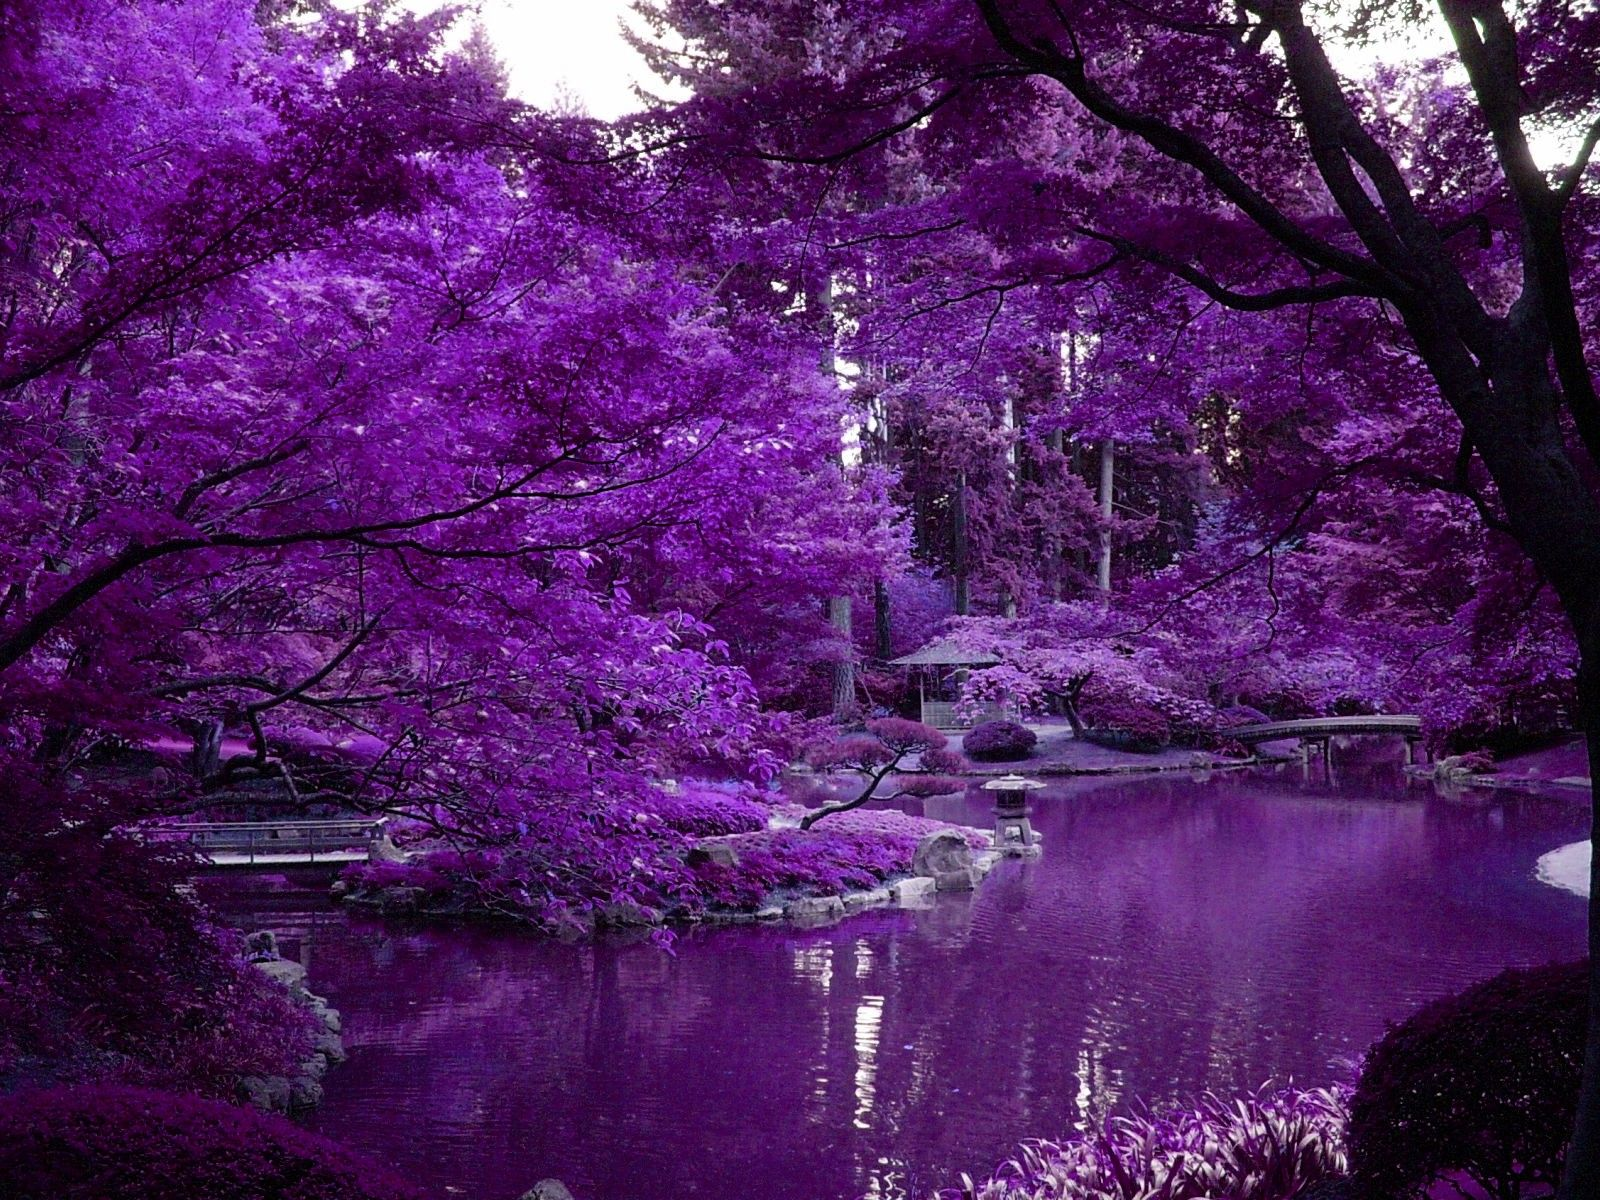 Japanese garden flowers lake garden spring beautiful art - Purple Japanese Garden Lakes Wallpaper Id 1144707 Desktop Nexus Nature